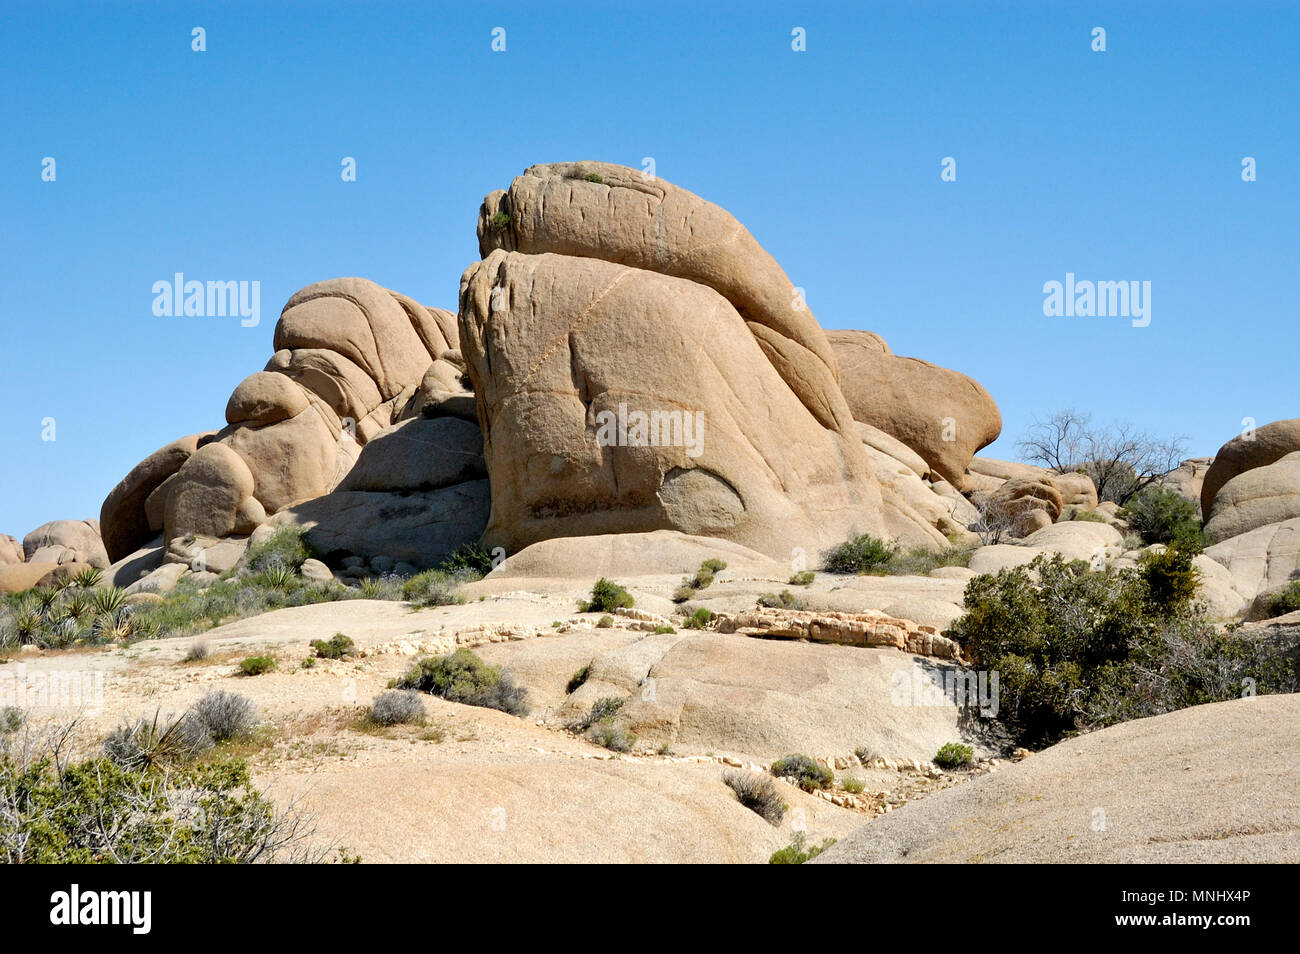 Indian Face Rock, Monzogranite rock pile, Aplitic veins, Jumbo Rocks, Joshua Tree National Park, CA 040410_0701 - Stock Image